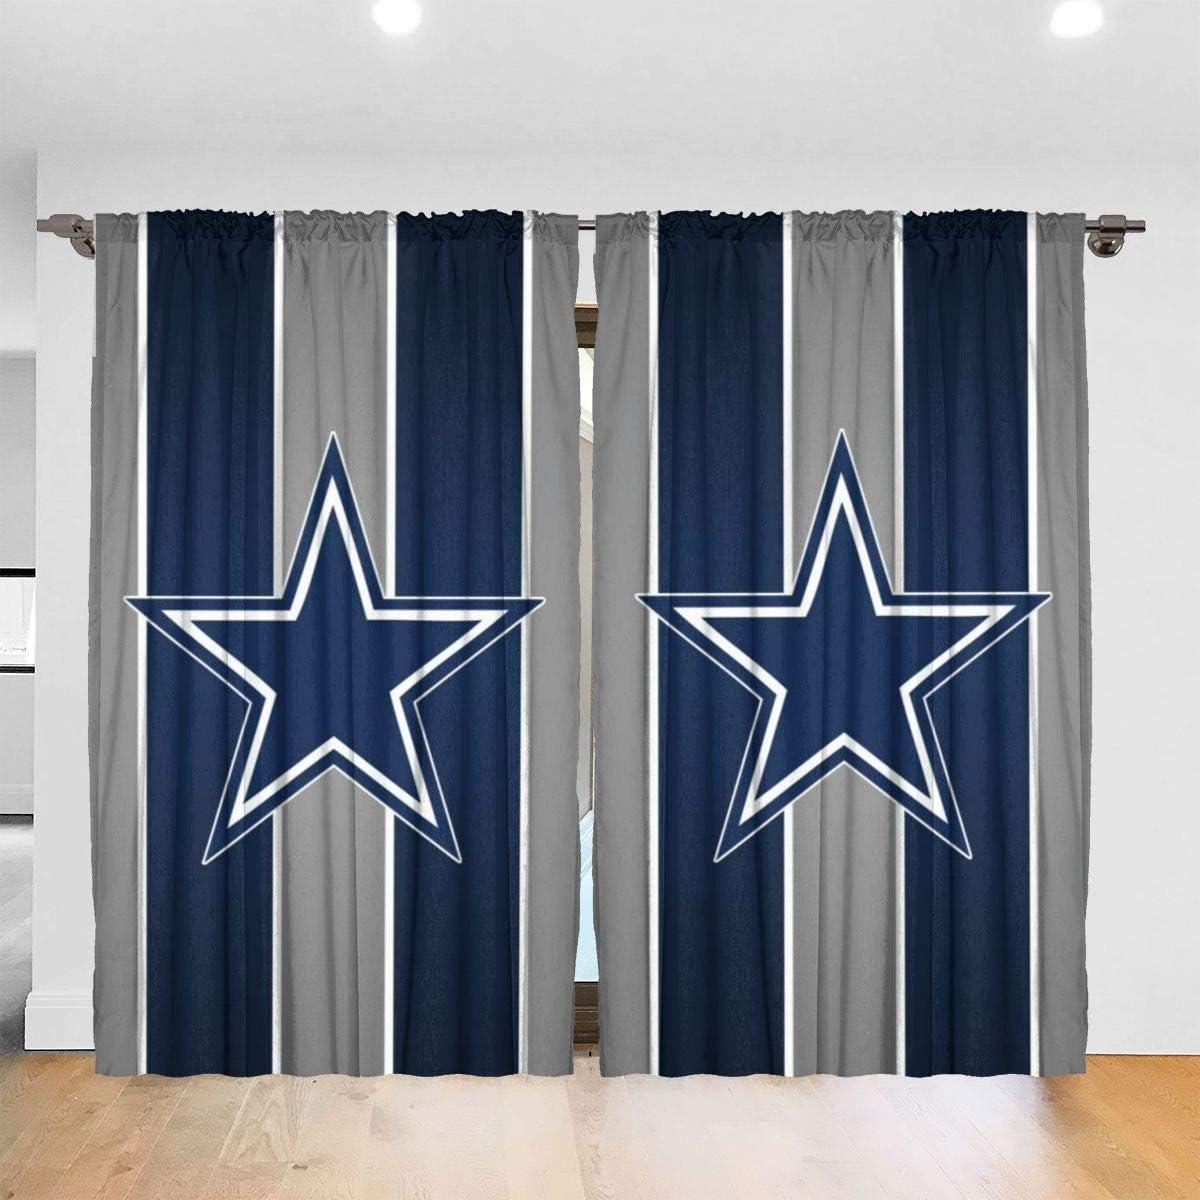 RWNFA Blue Star Stripes Blackout Curtains 48